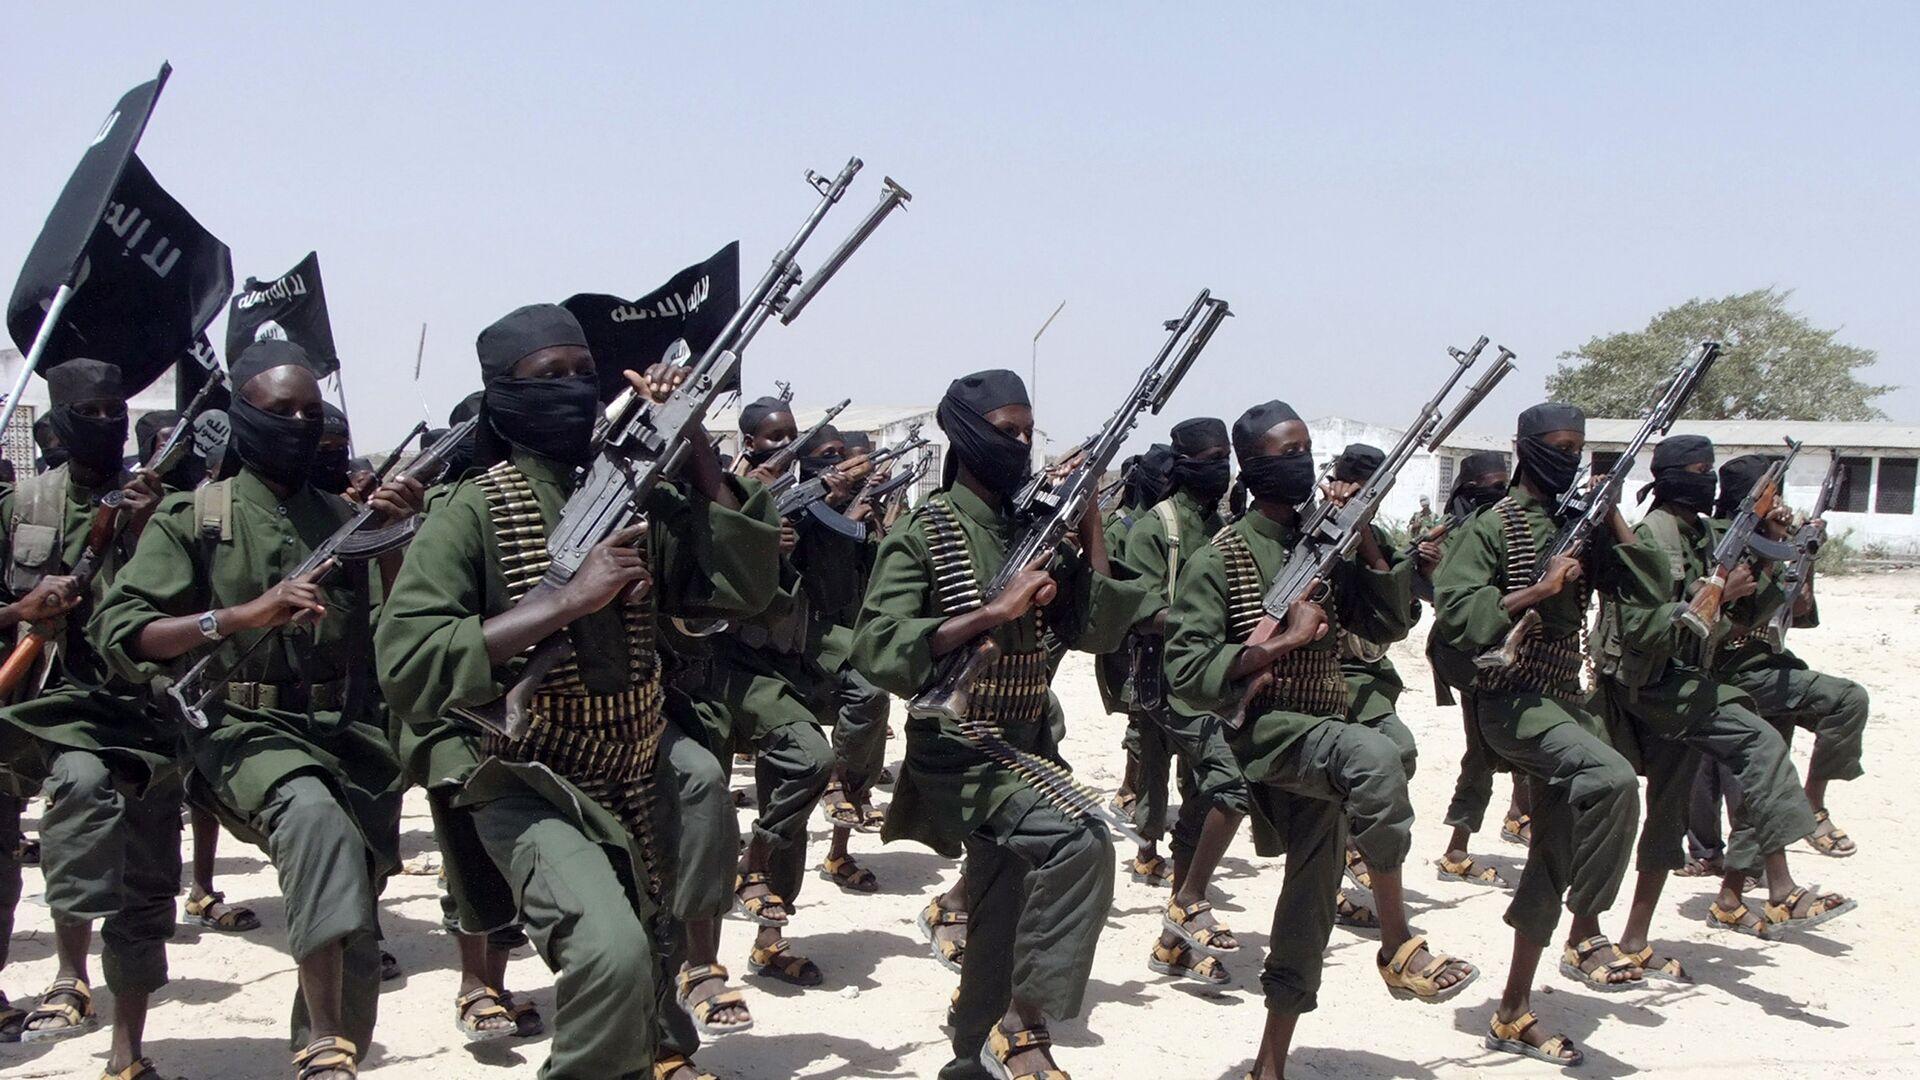 hundreds of newly trained al-Shabab fighters perform military exercises in the Lafofe area some 18 km south of Mogadishu, in Somalia. Somalia's Islamic extremist rebels, al-Shabab, - Sputnik Mundo, 1920, 12.10.2021